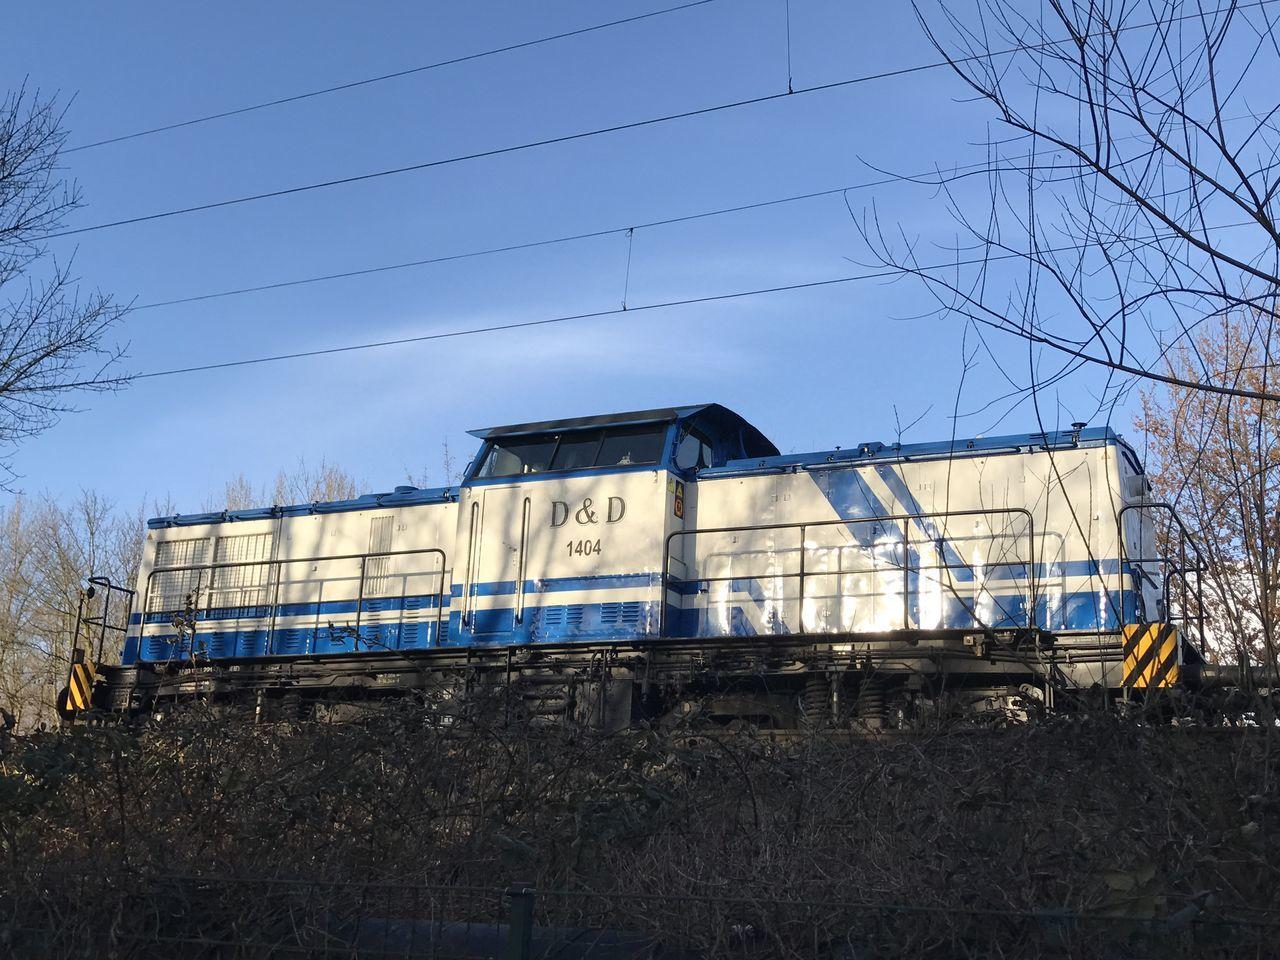 freight train Freight Train Freight Transportation Industry Locomotive Mode Of Transport Public Transportation Rail Freight Railroad Track Traffic Train Trains Transportation